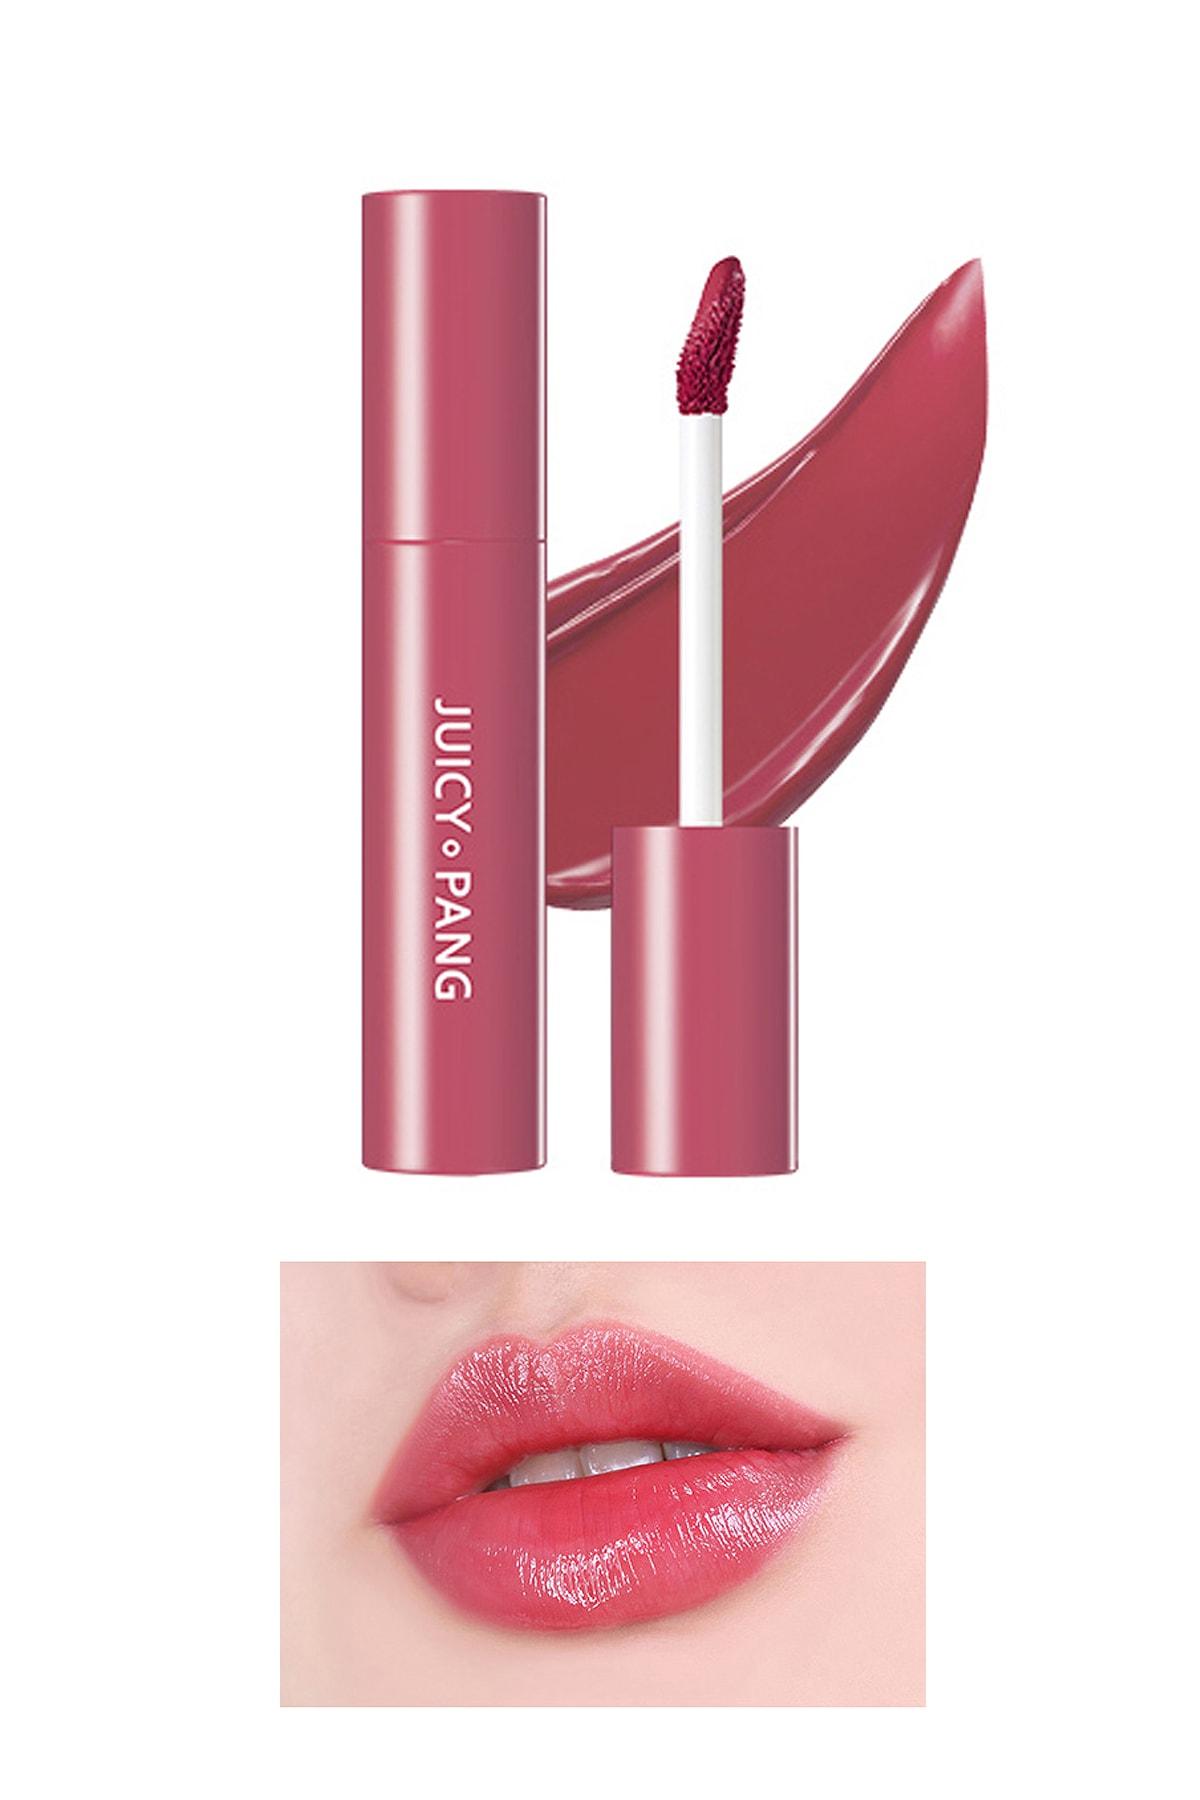 Missha Uzun Süre Kalıcı Parlak Su Bazlı Jel Tint  APIEU Juicy-Pang Sugar Tint (PK02) 0